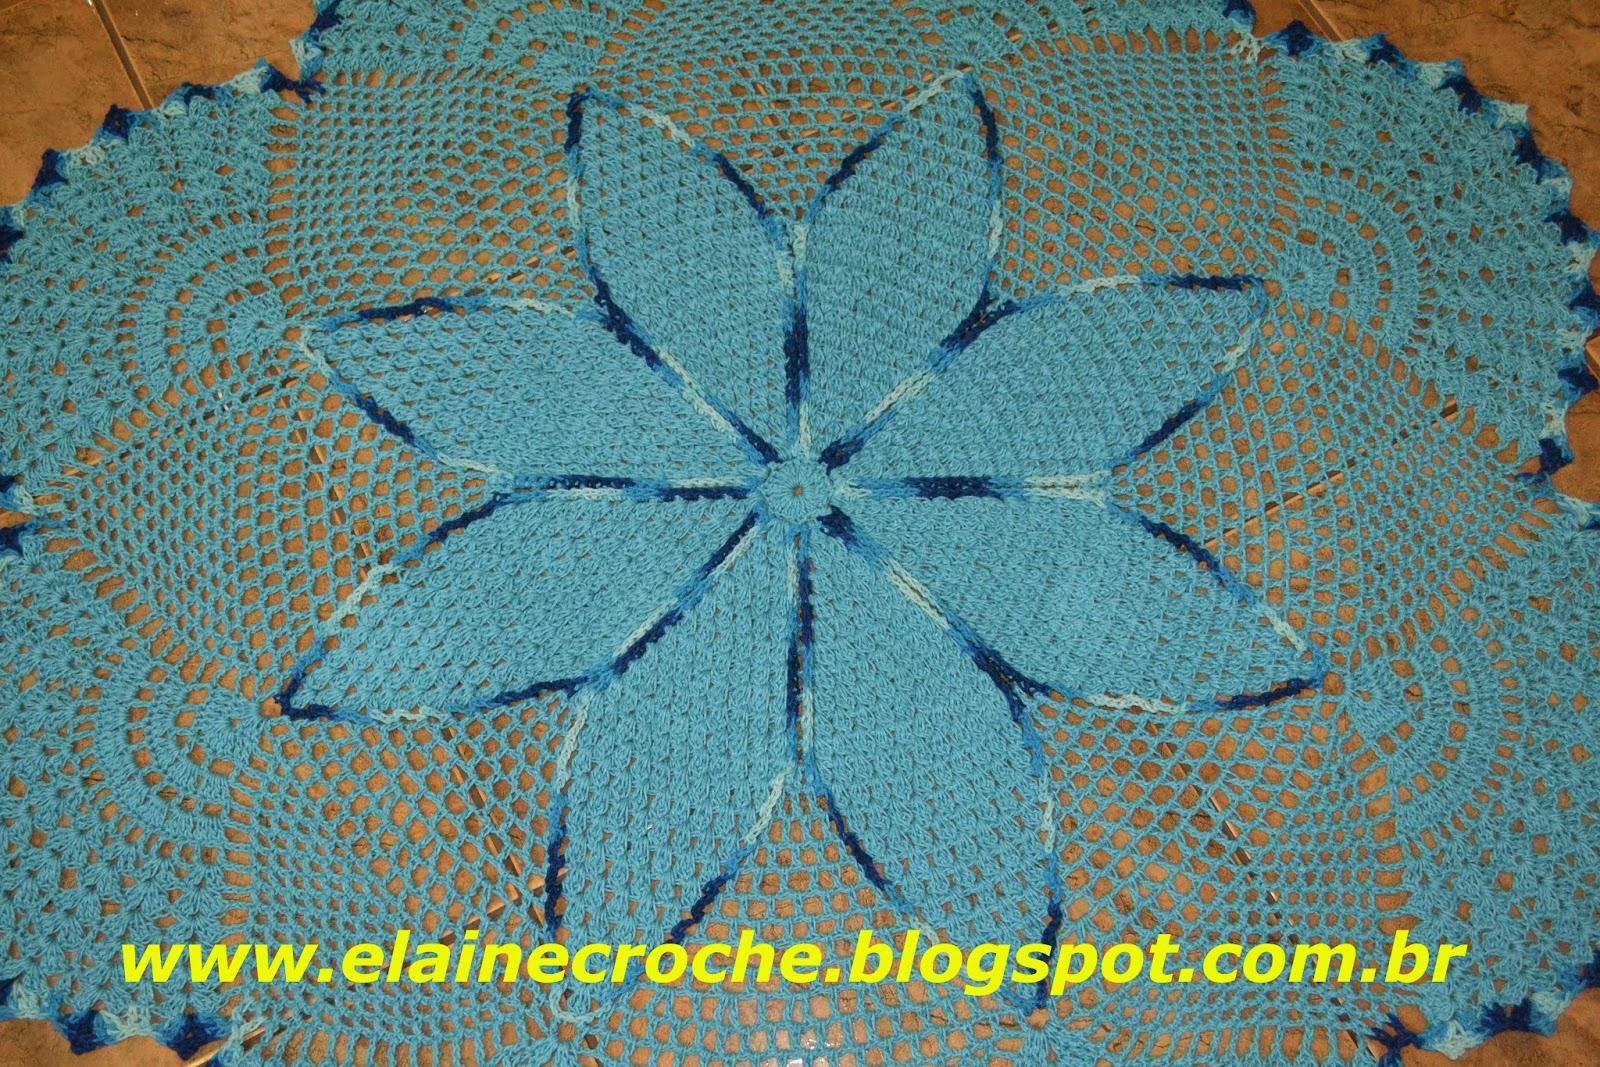 Elaine Croche Tapete Yuca Em Croch V Deo Aula Croch